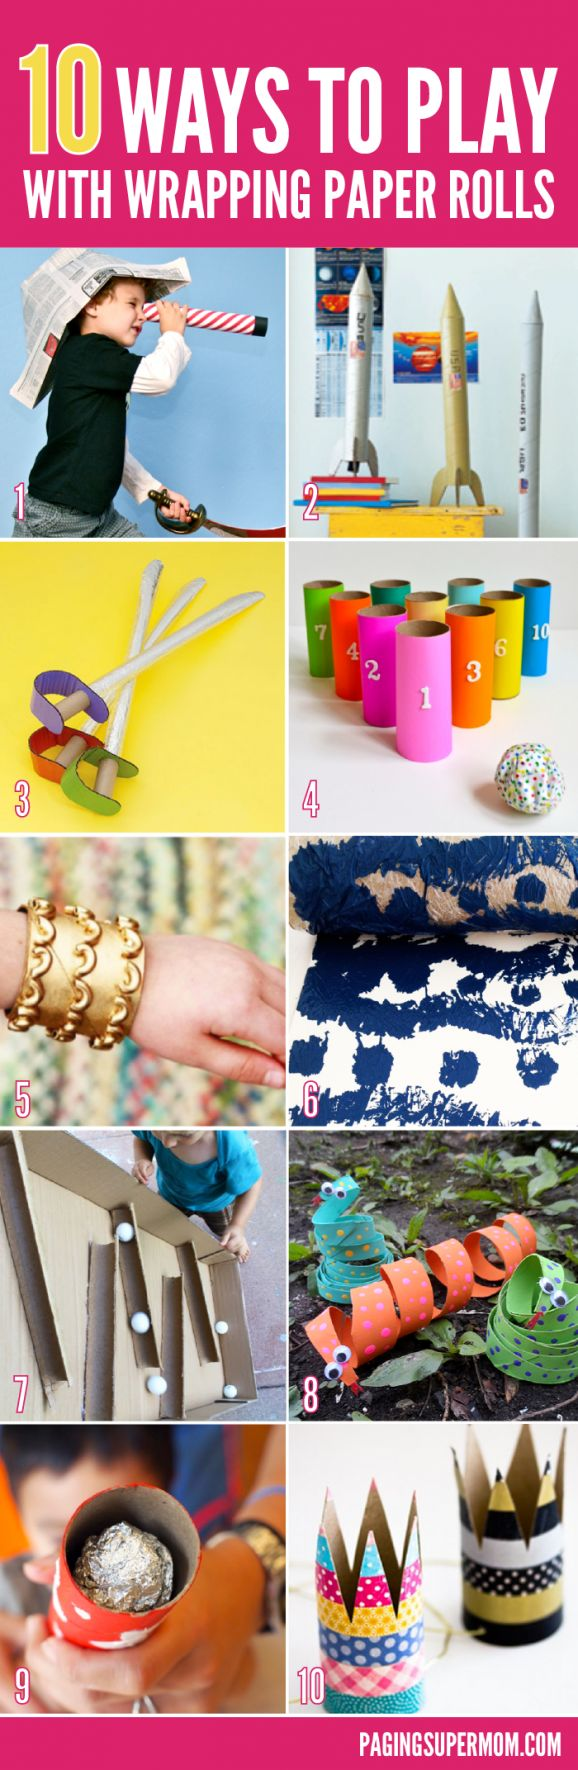 10 Fun Ways to Use Wrapping Paper Rolls via @PaigngSupermom #Christmas #KidsCrafts